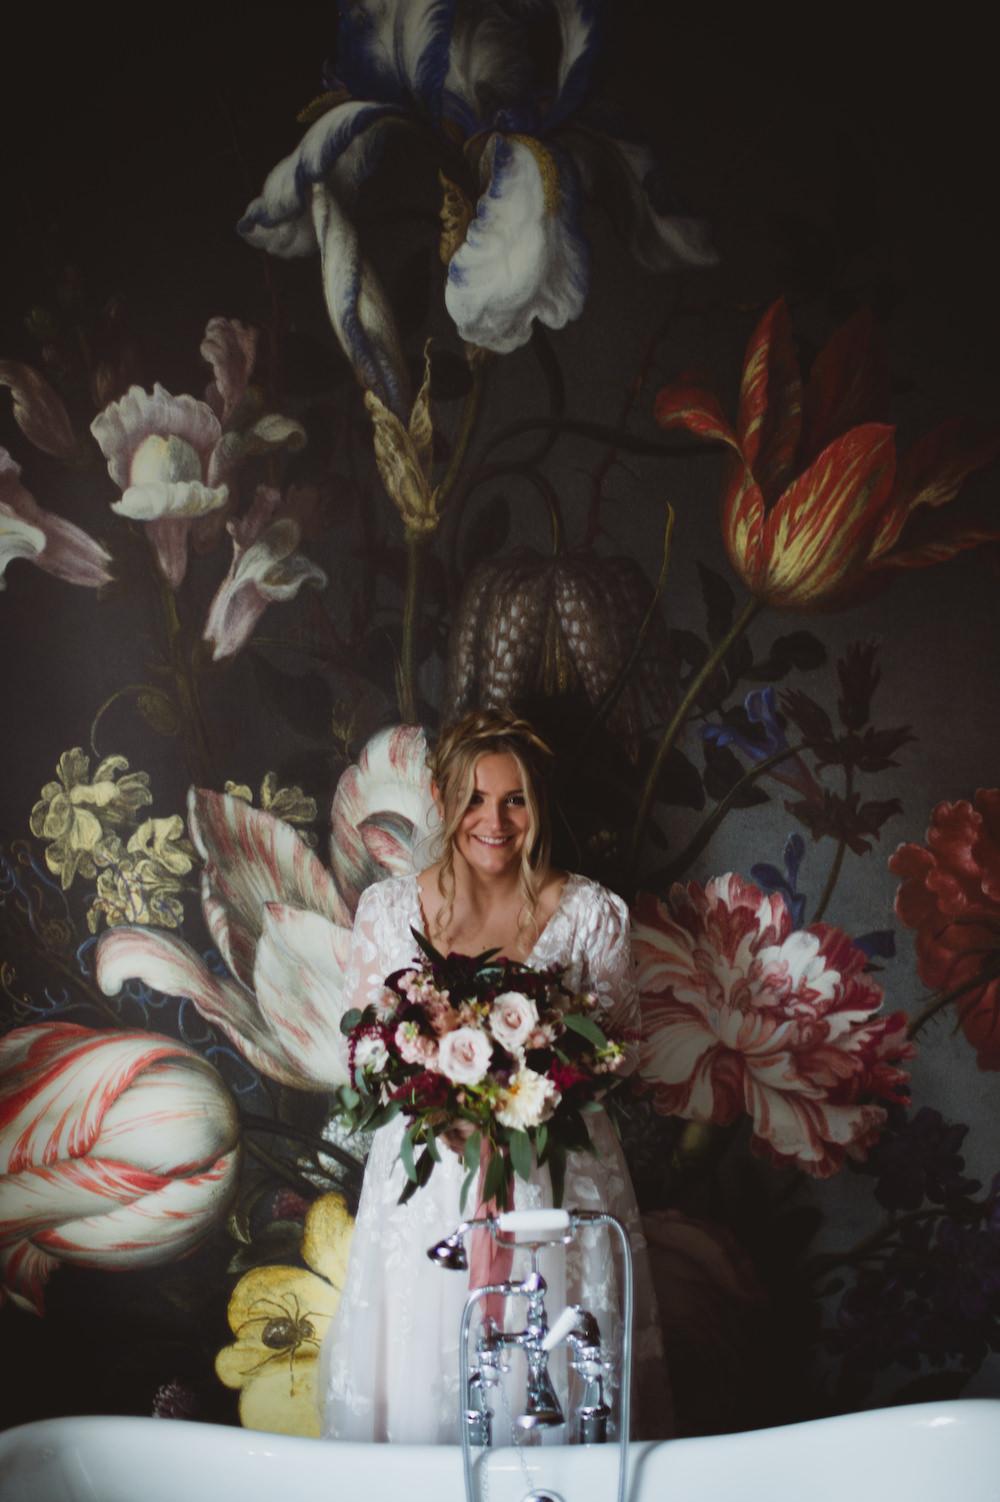 Dress Gown Bride Bridal David's Bridal Lace Long Sleeves Veil Garthmyl Hall Wedding Sasha Weddings